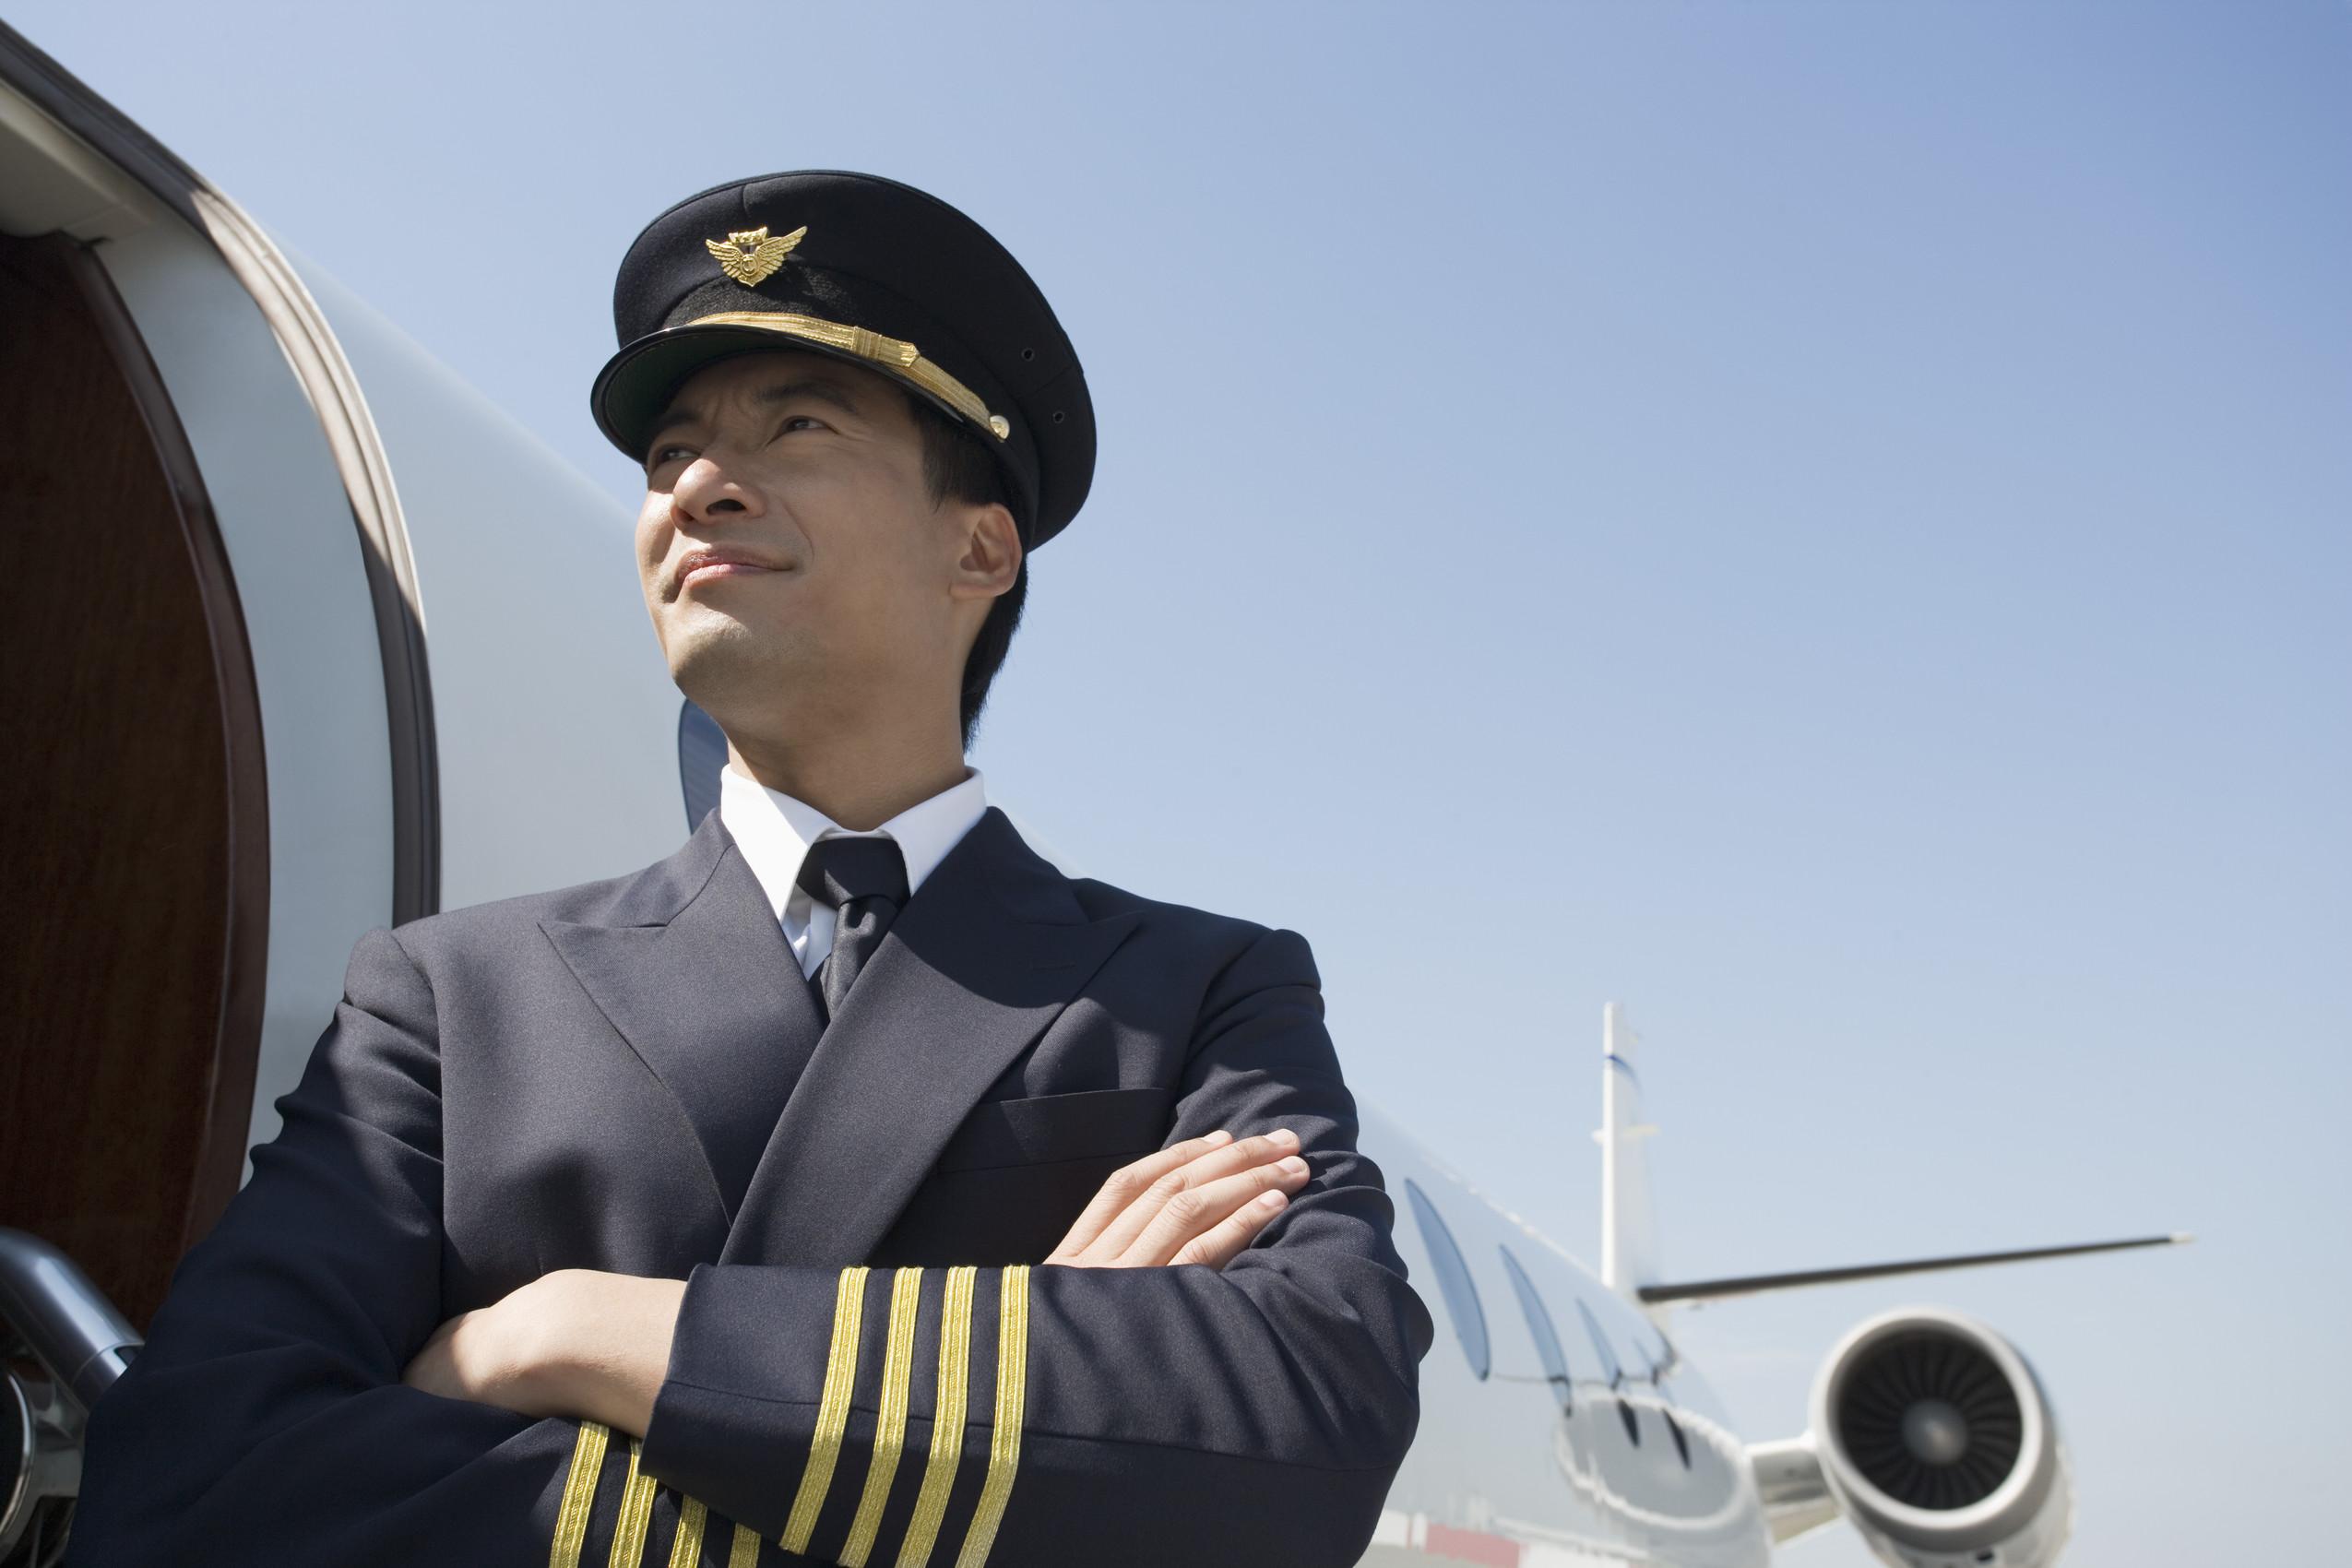 Пилот в картинках, картинку